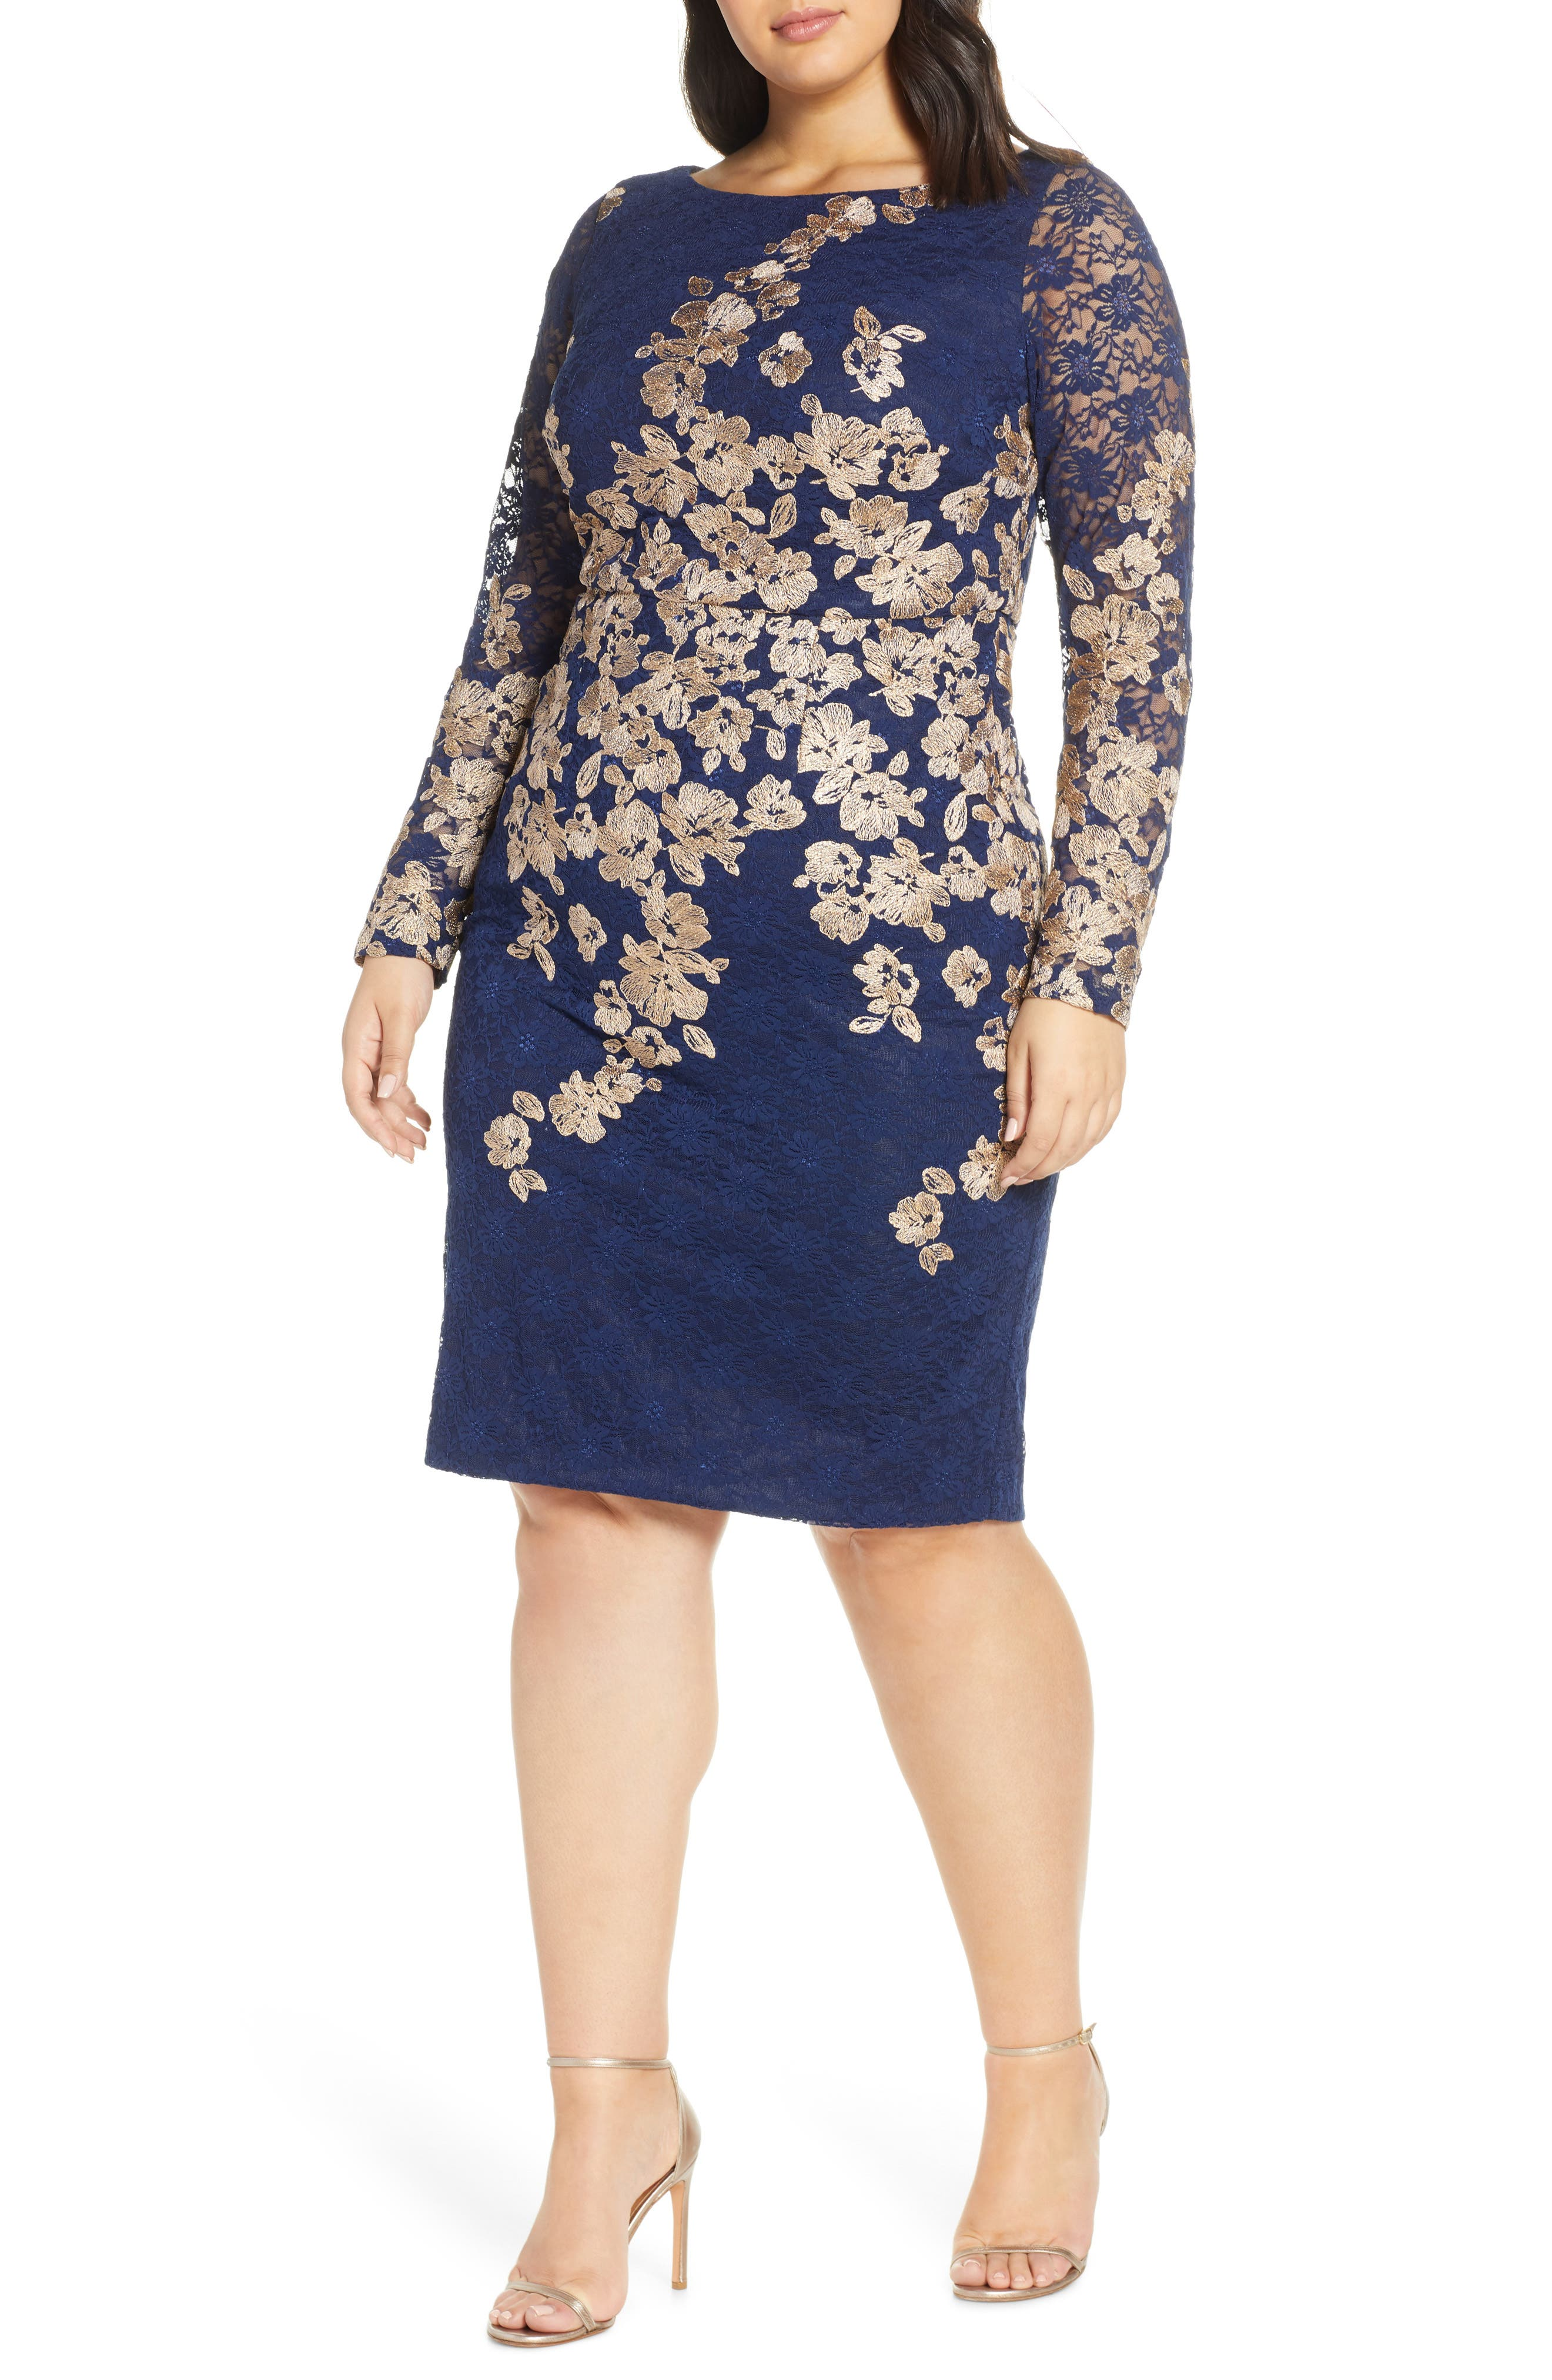 Plus Size Xscape Embroidered Lace Long Sleeve Sheath Dress, Blue